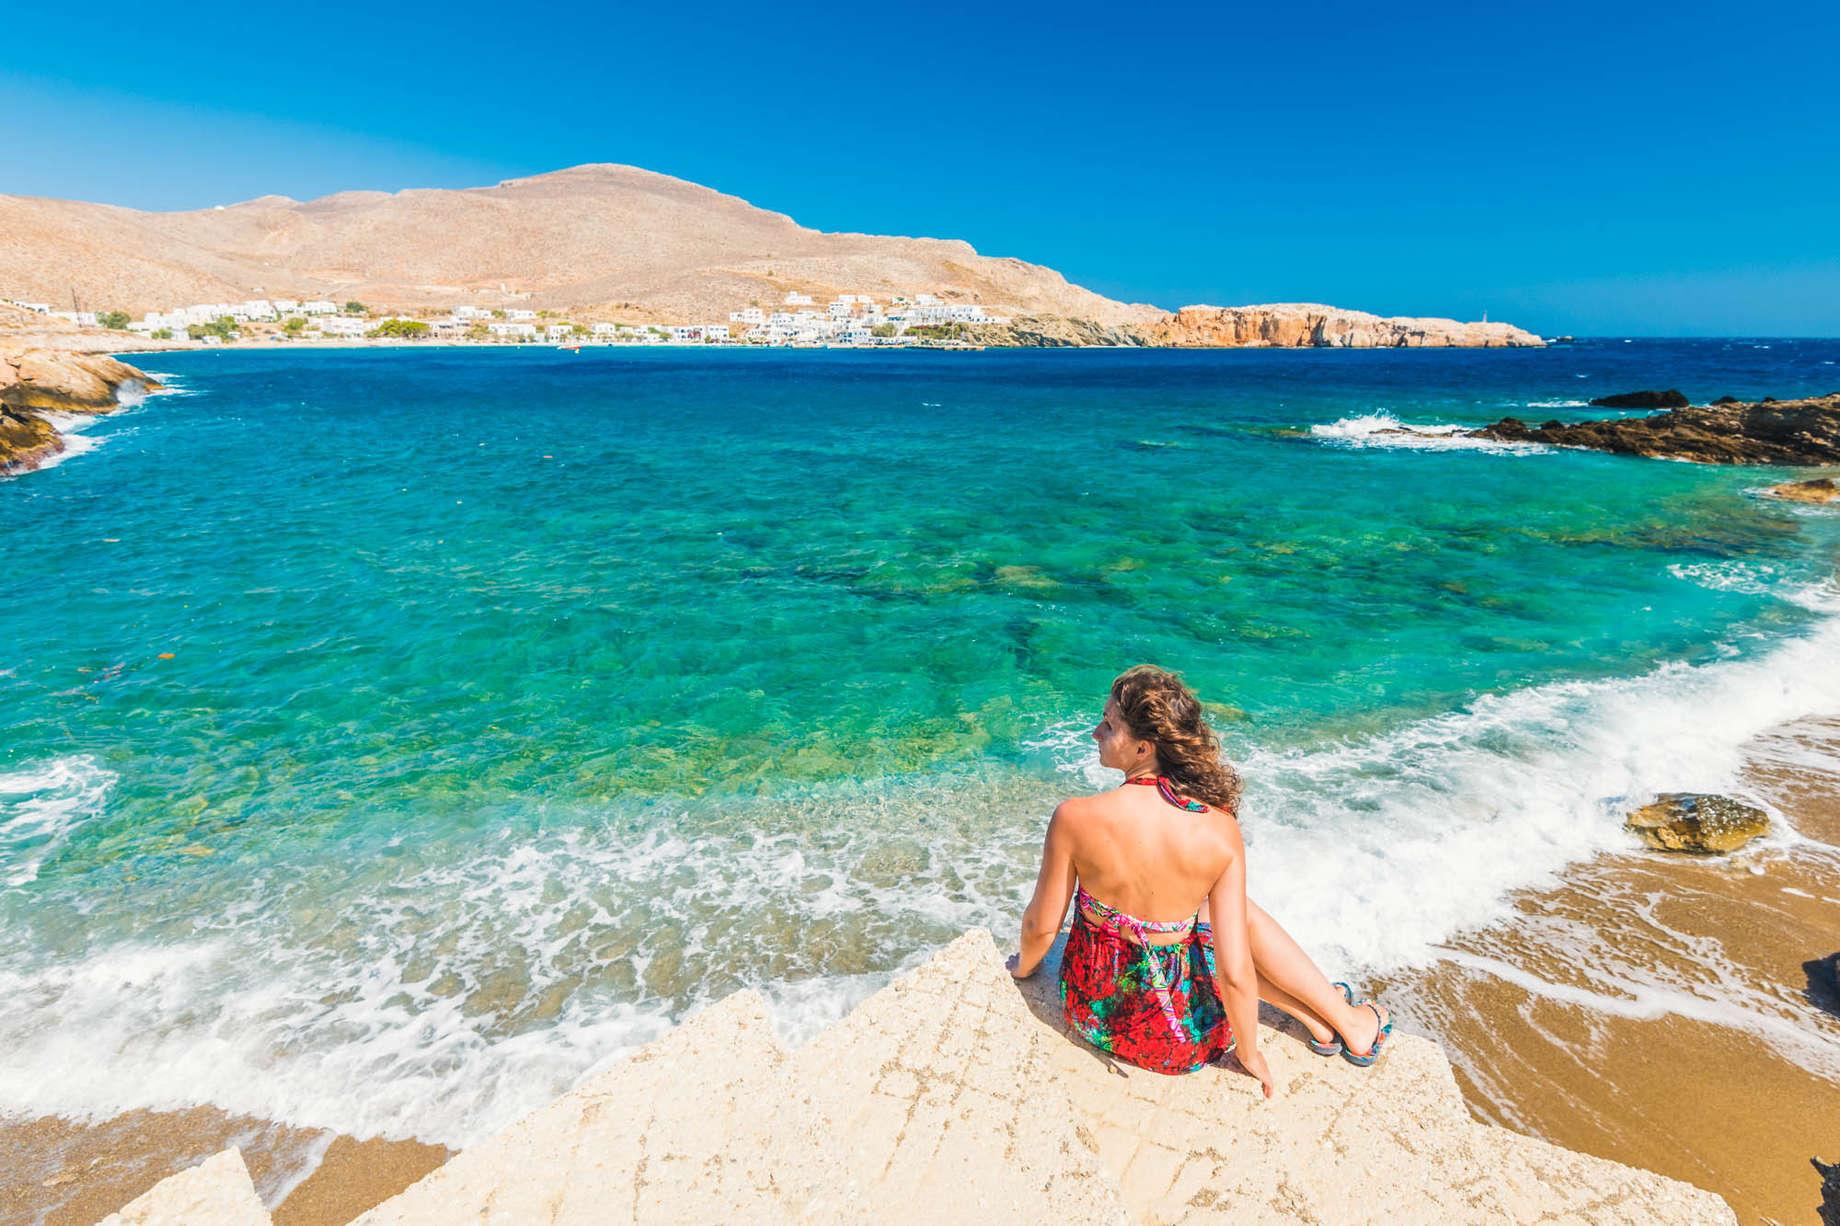 Folegandros, Cyclades Islands, Greece |   Manuel Breva Colmeiro/moment/getty images